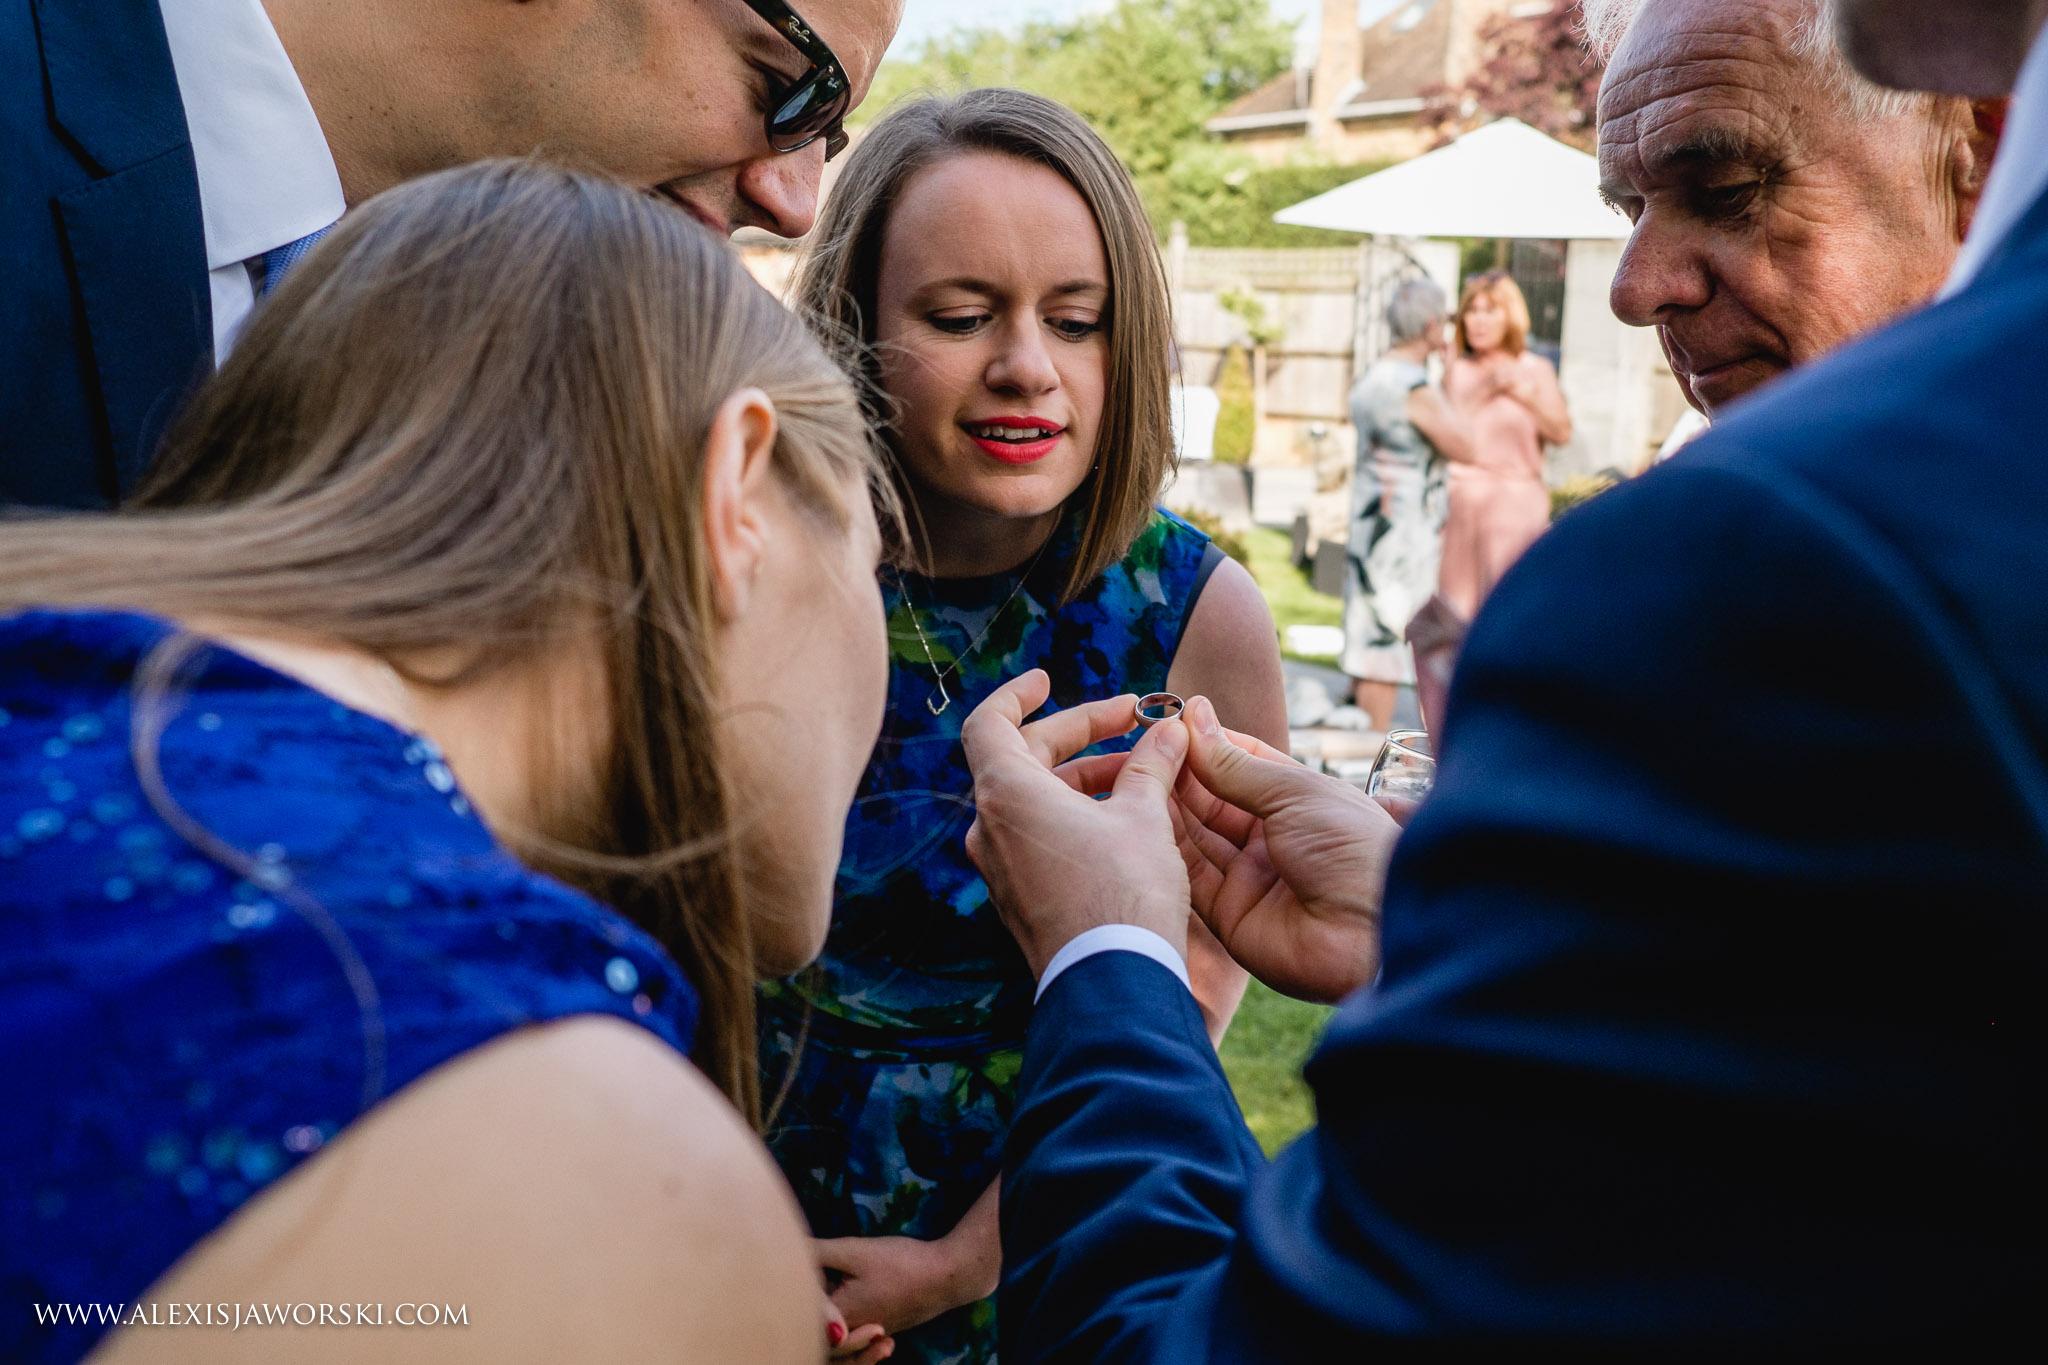 guests looking at groom wedding ring